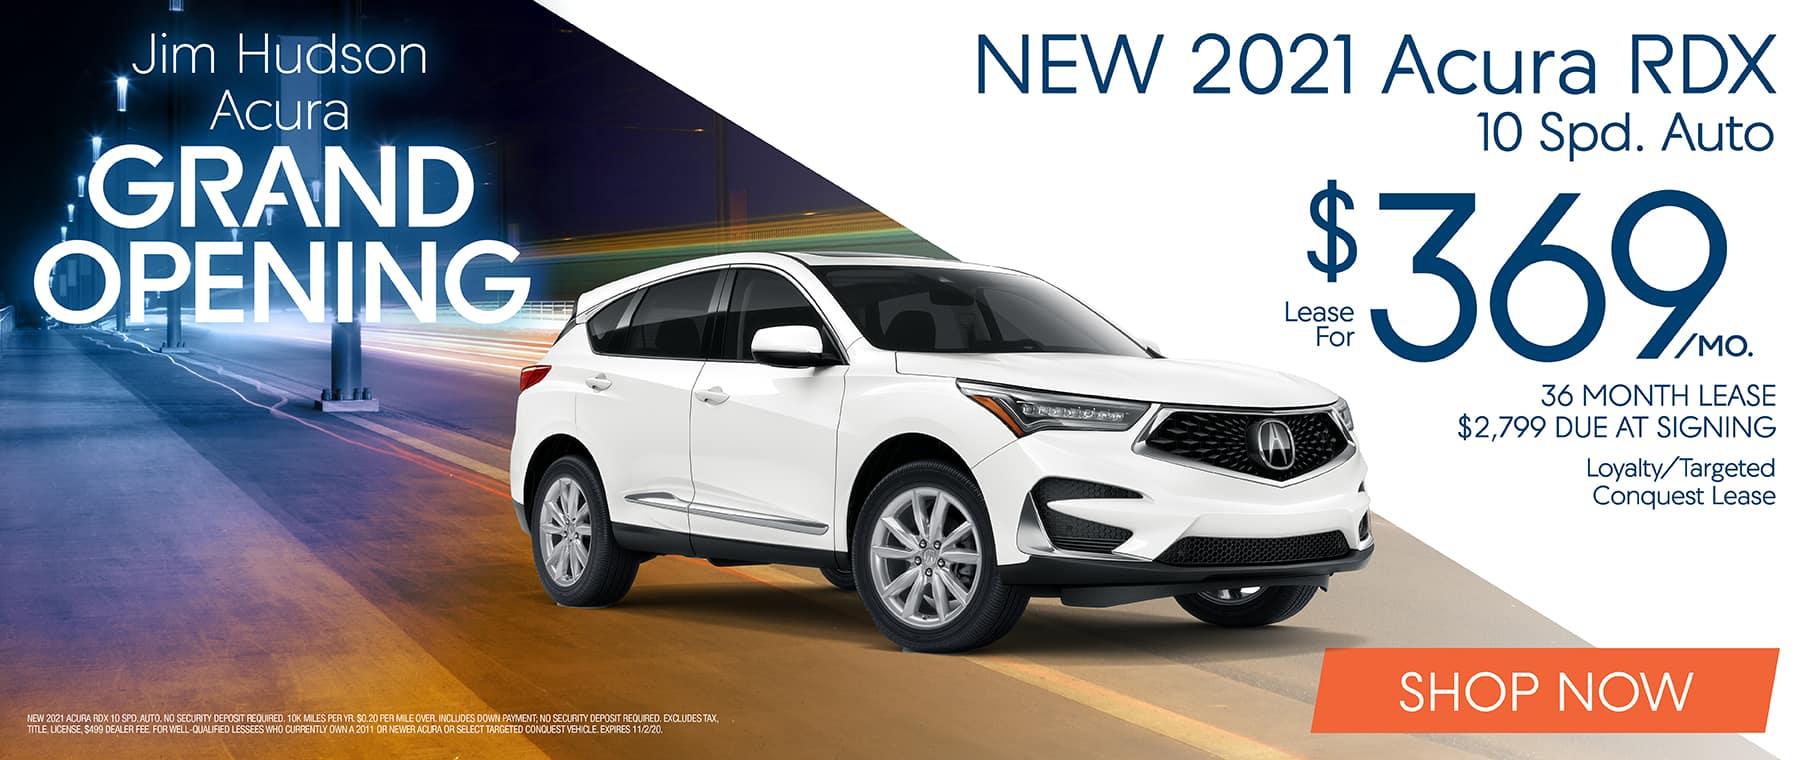 New 2021 Acura RDX